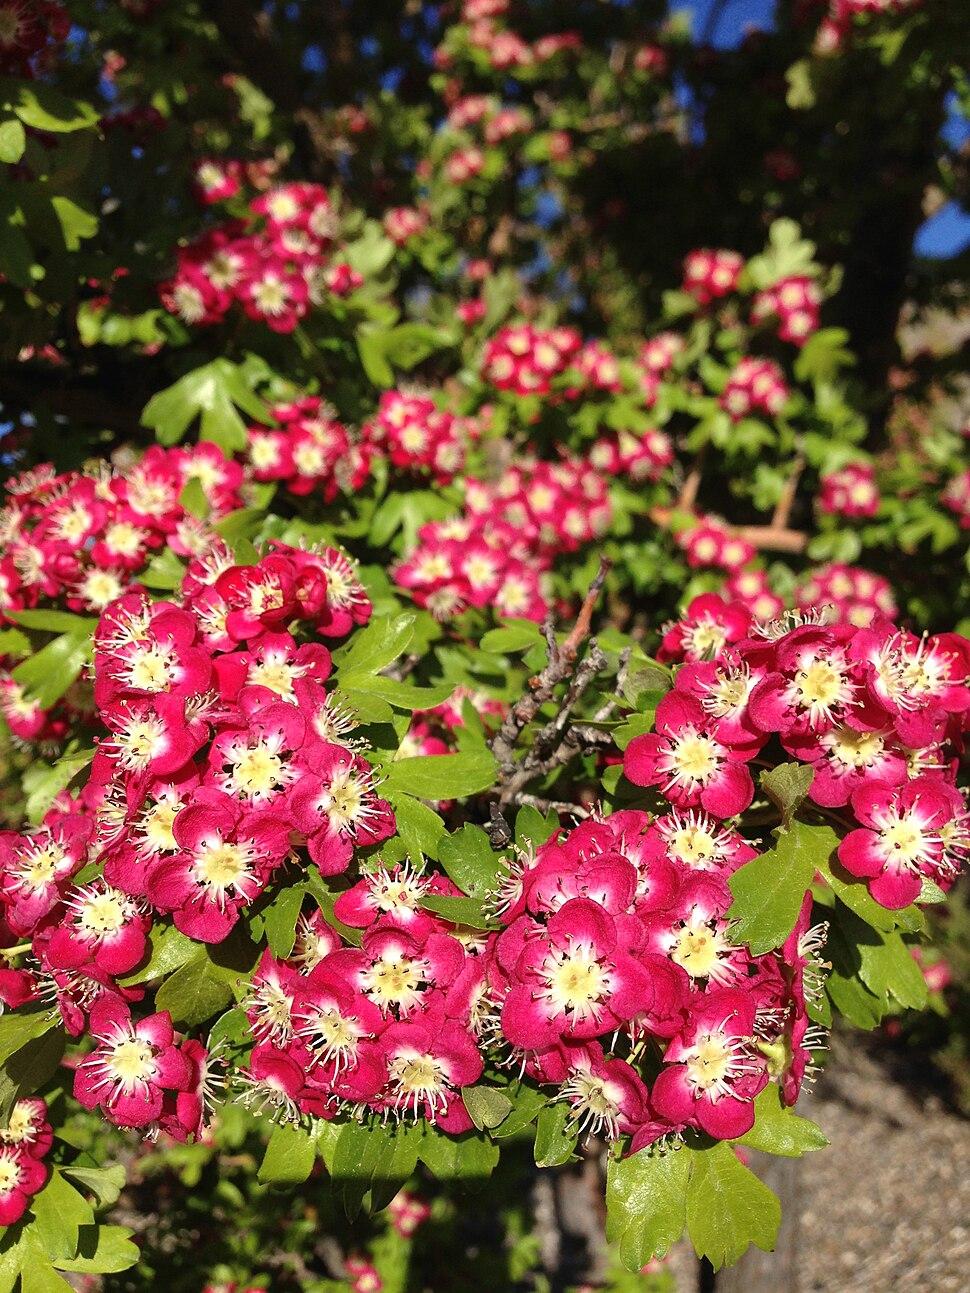 2013-05-23 07 24 06 Crataegus monogyna 'Crimson Cloud' blossoms in Elko Nevada